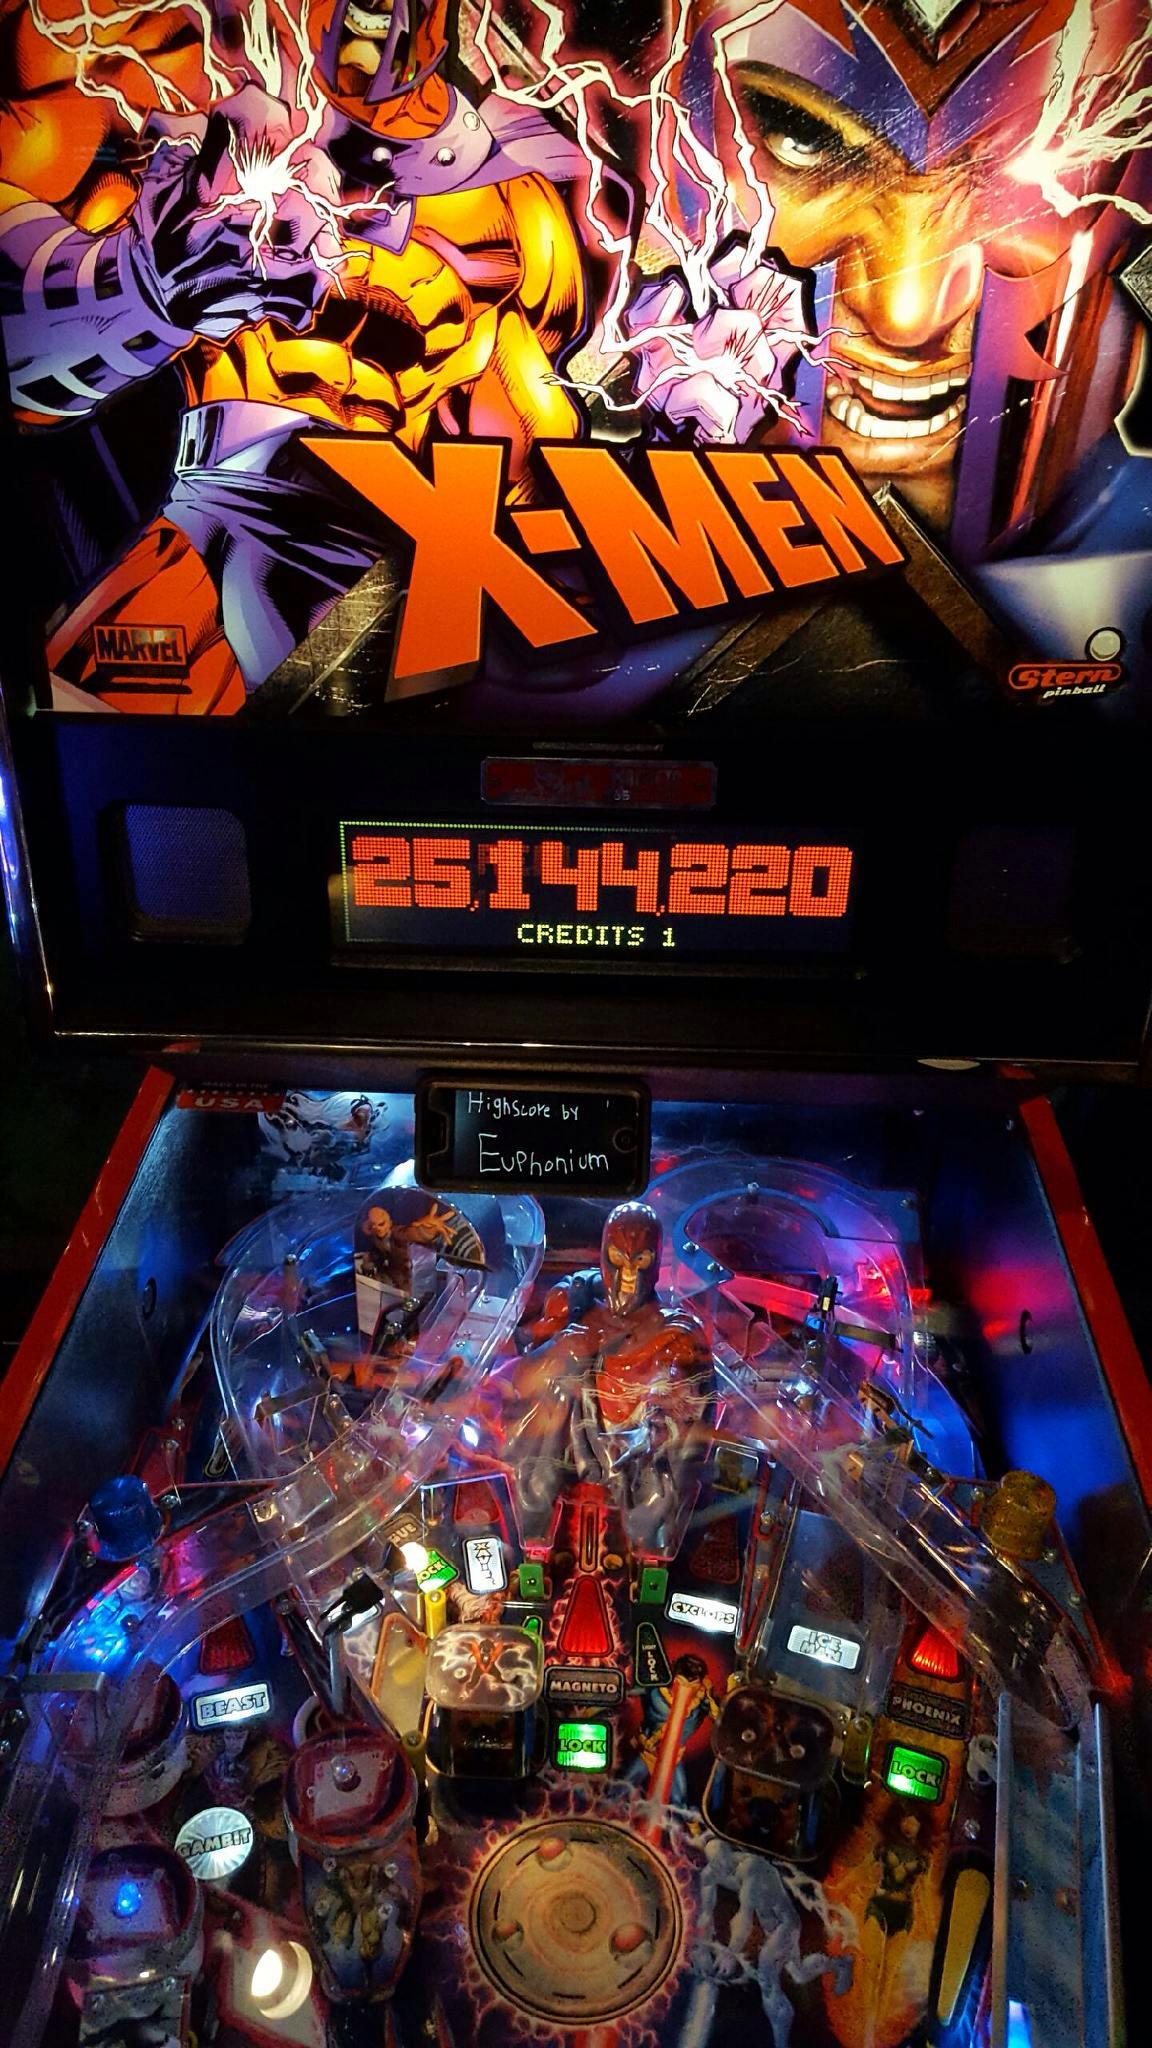 euphonium: X-Men Magneto LE (Pinball: 3 Balls) 25,144,220 points on 2016-06-09 23:22:55